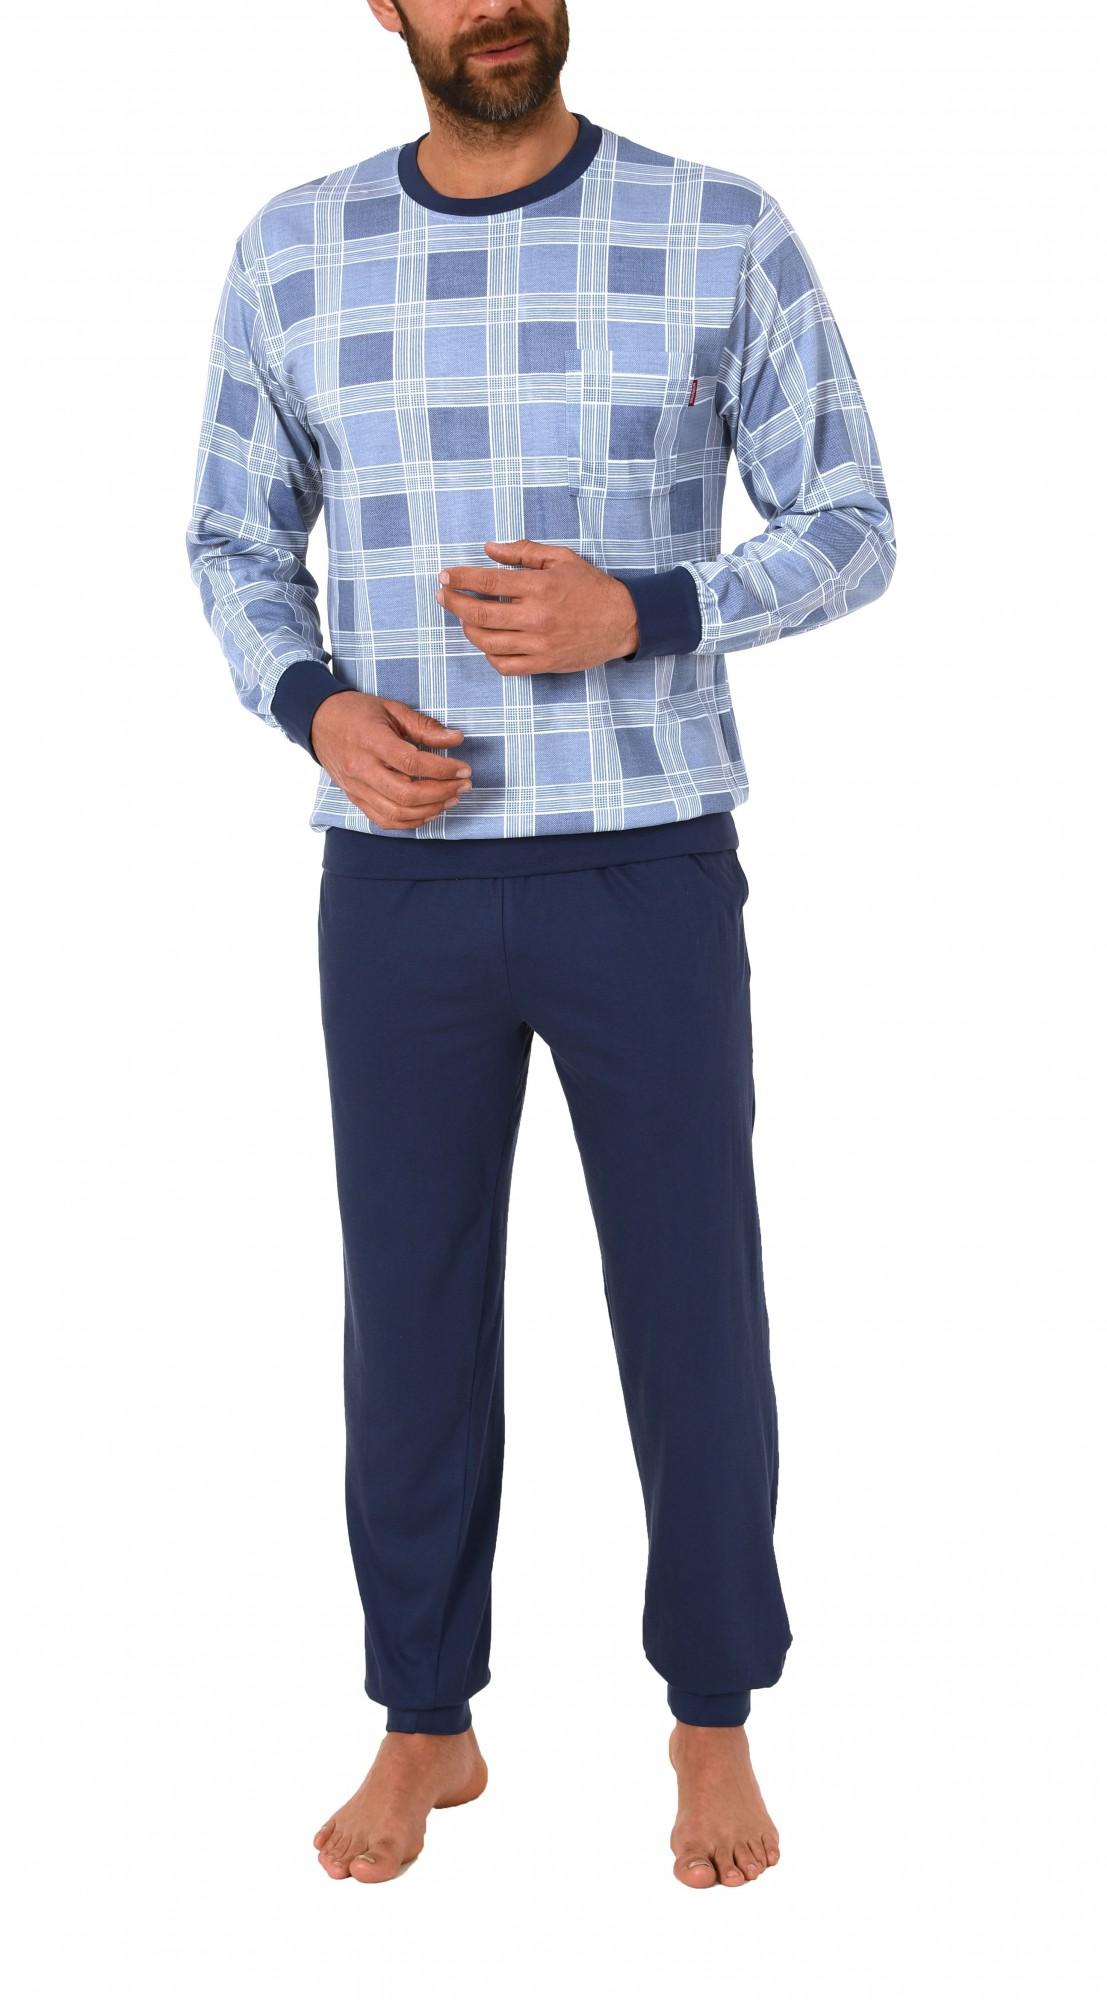 Edler Herren Pyjama langarm Schlafanzug mit Bündchen 60625 – Bild 2